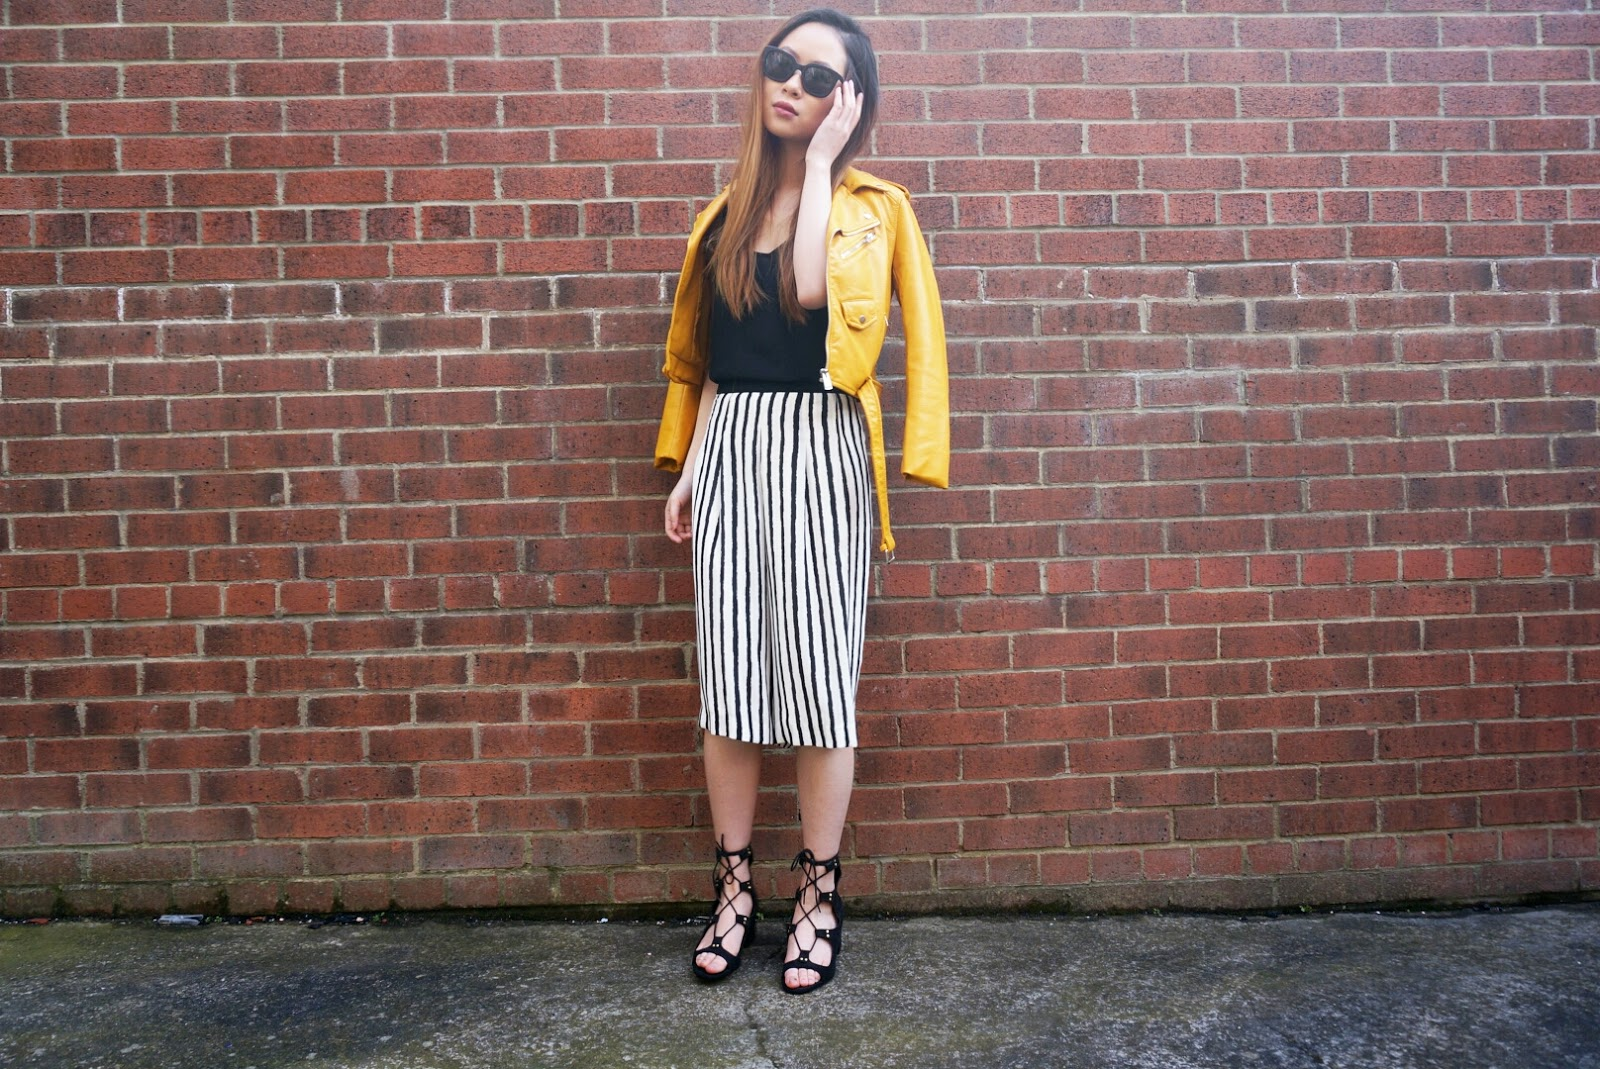 Leather jacket yellow stripe - 11 3 16